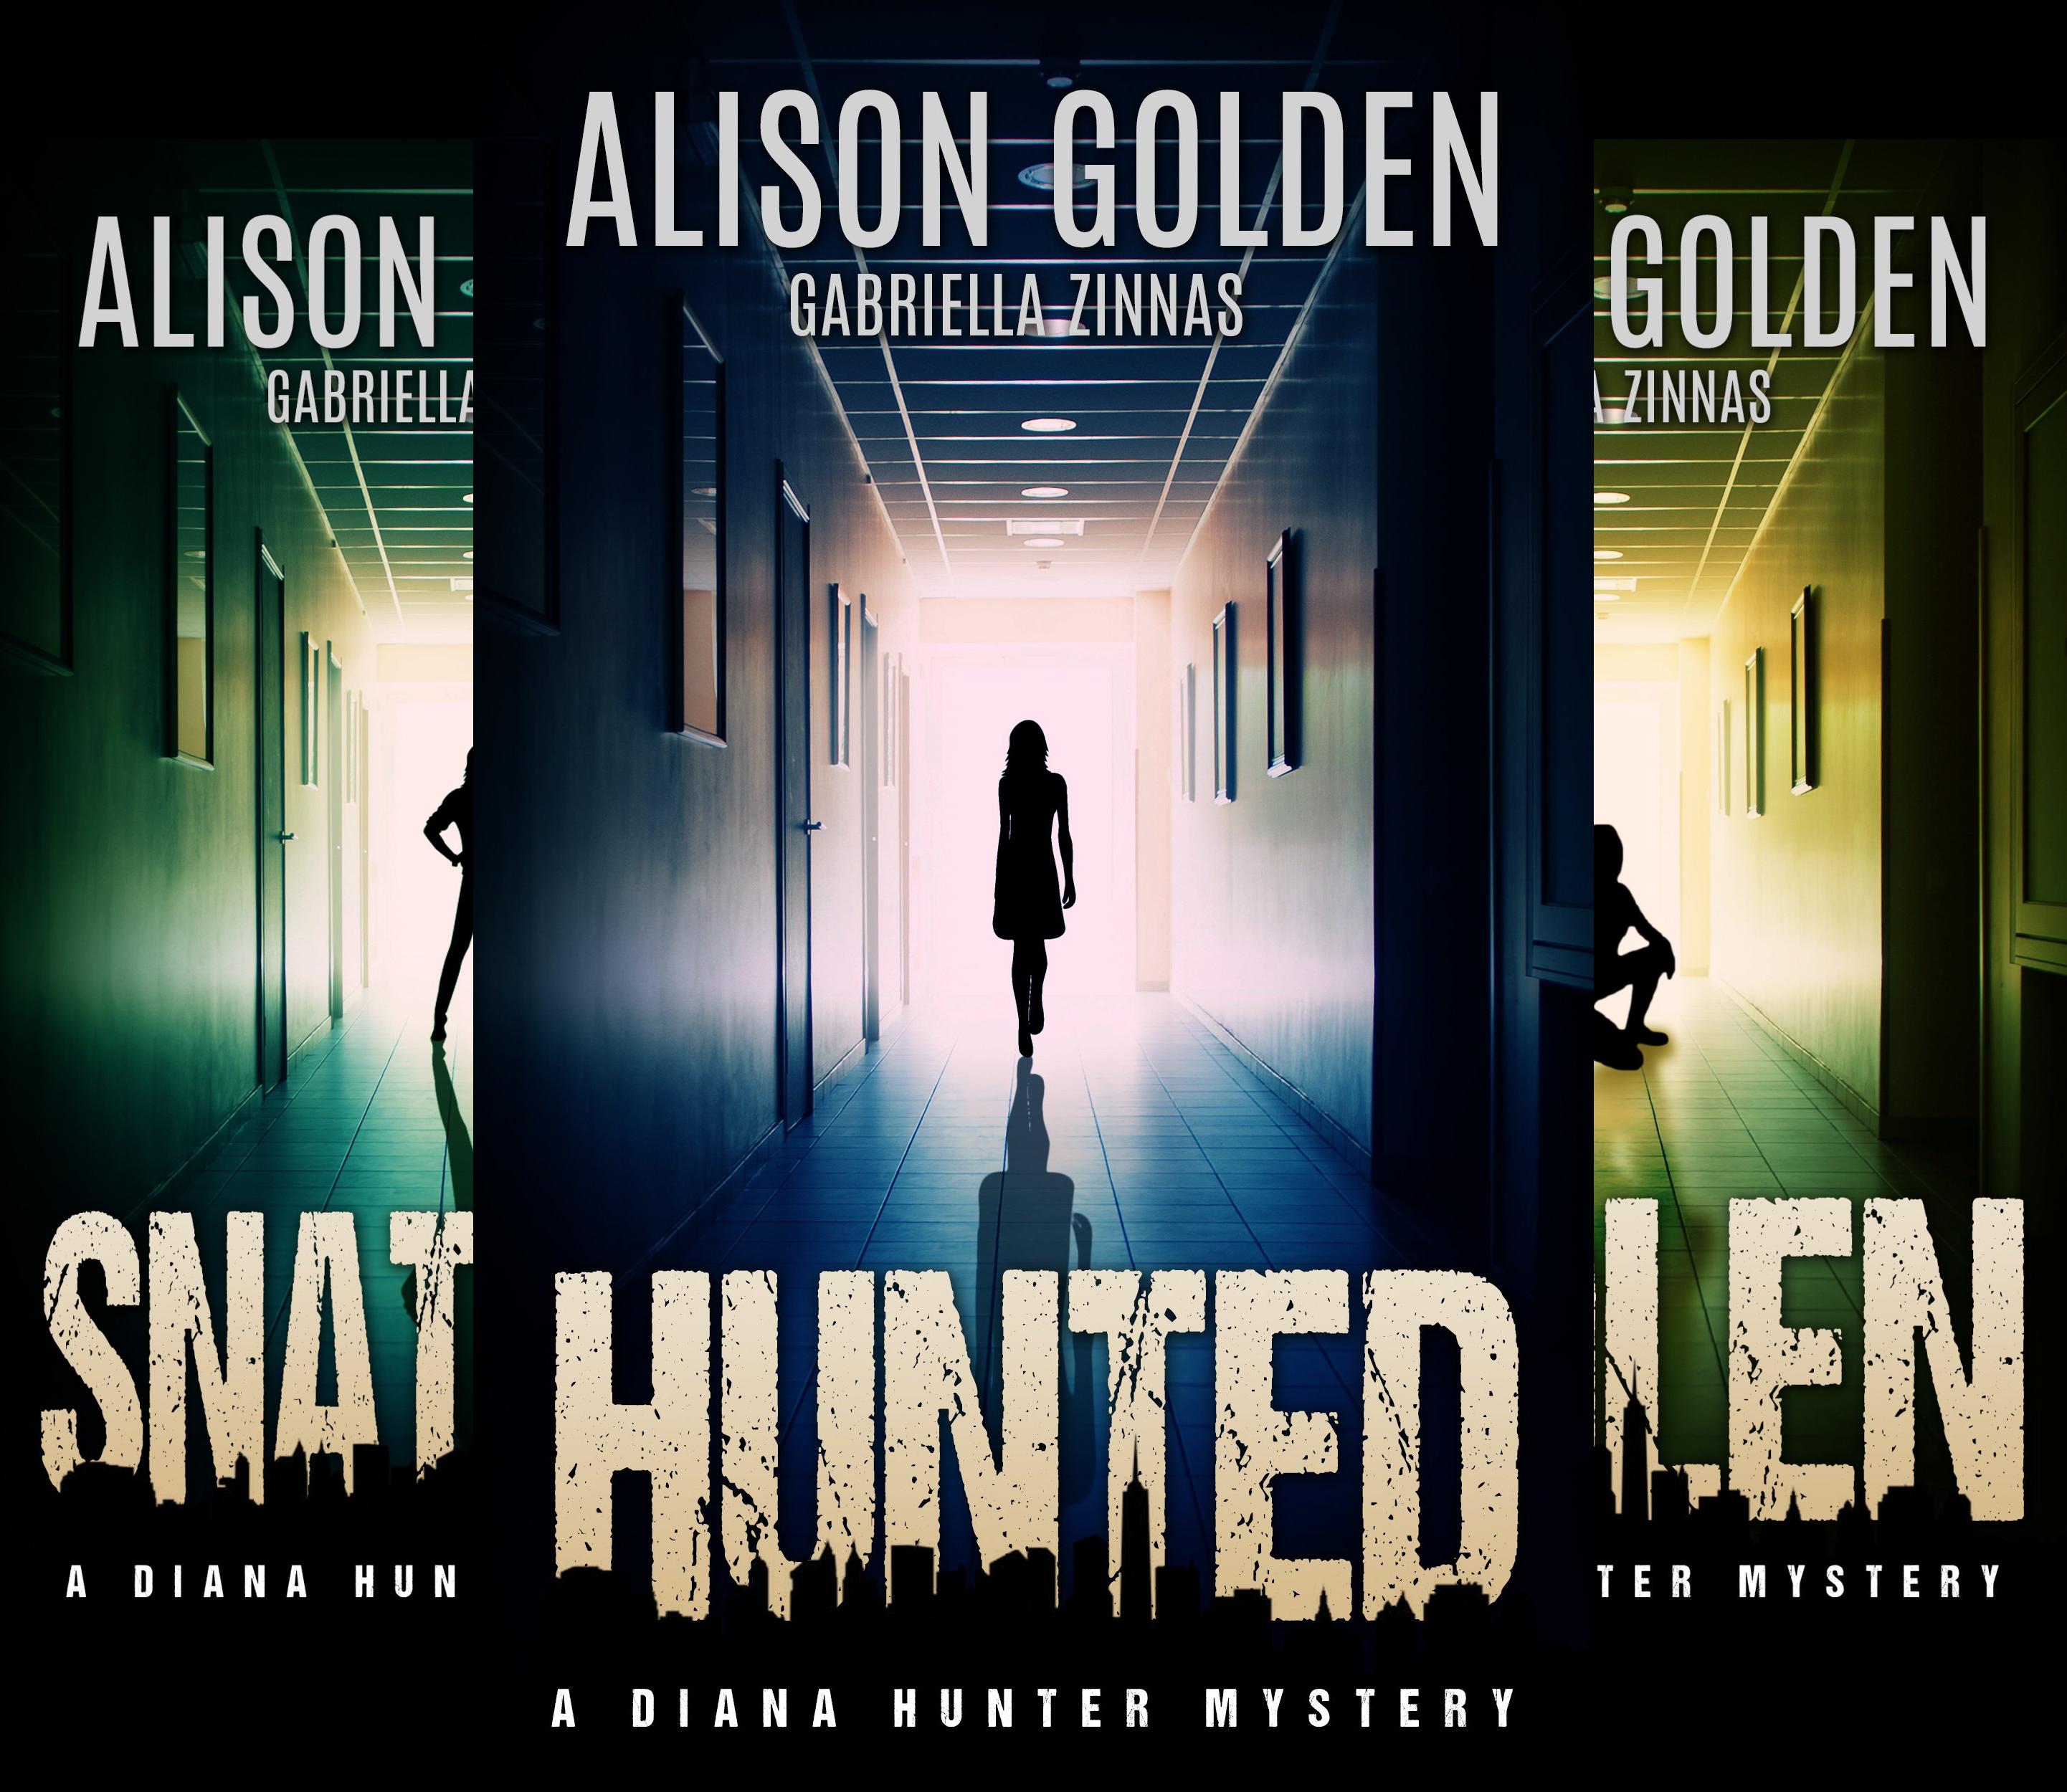 A Diana Hunter Mystery (4 Book Series)